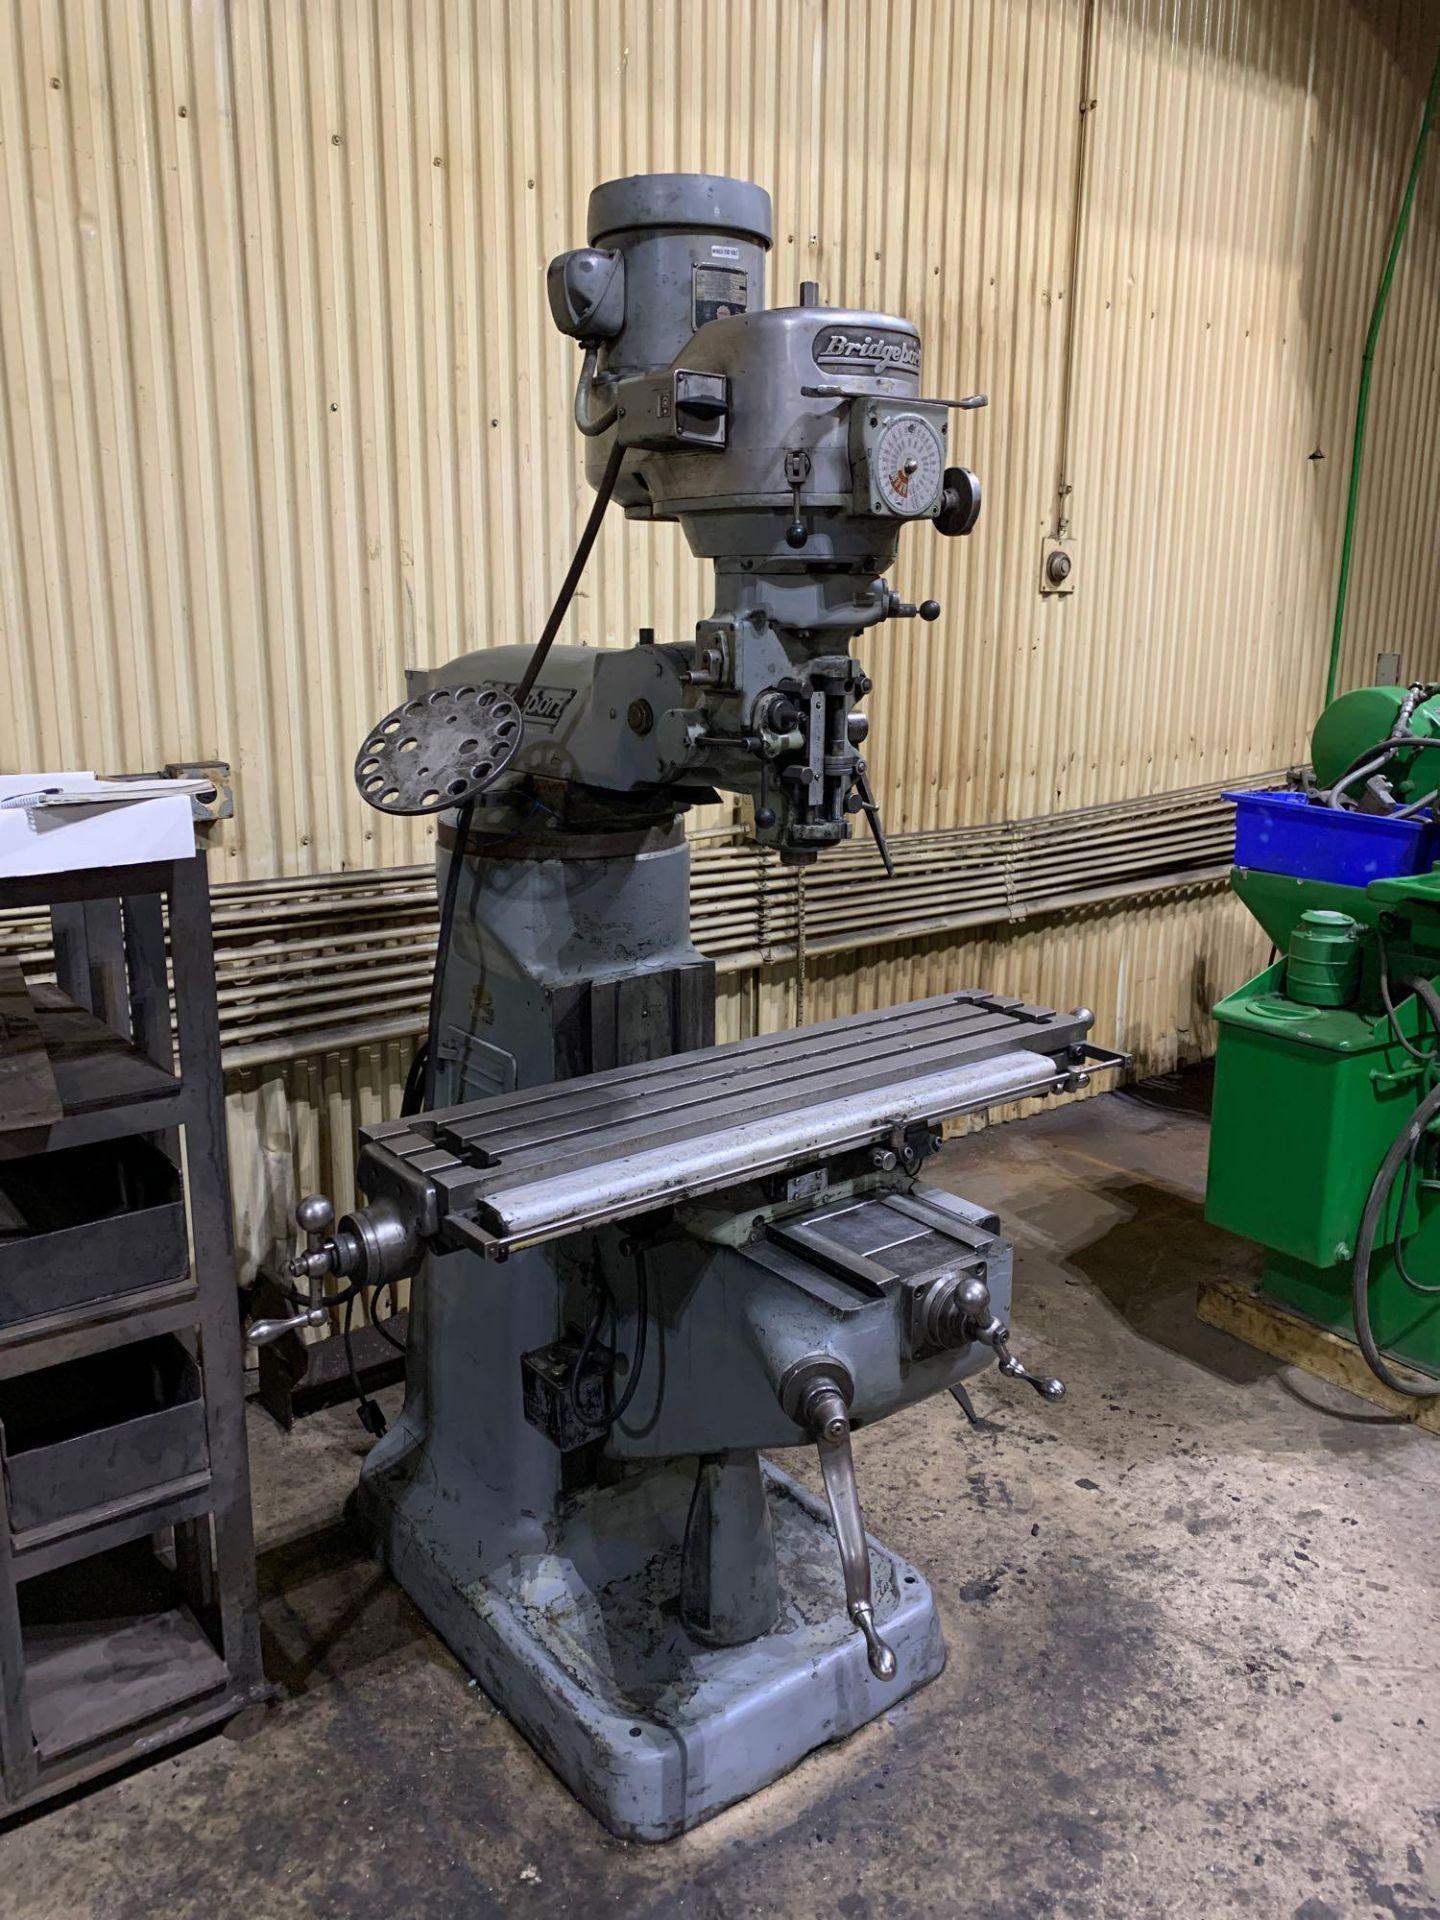 "Bridgeport 2J Vertical Milling Machine Variable Speed Head S/N 132833 CAPACITIES Table size: 9"" X 42 - Image 2 of 12"